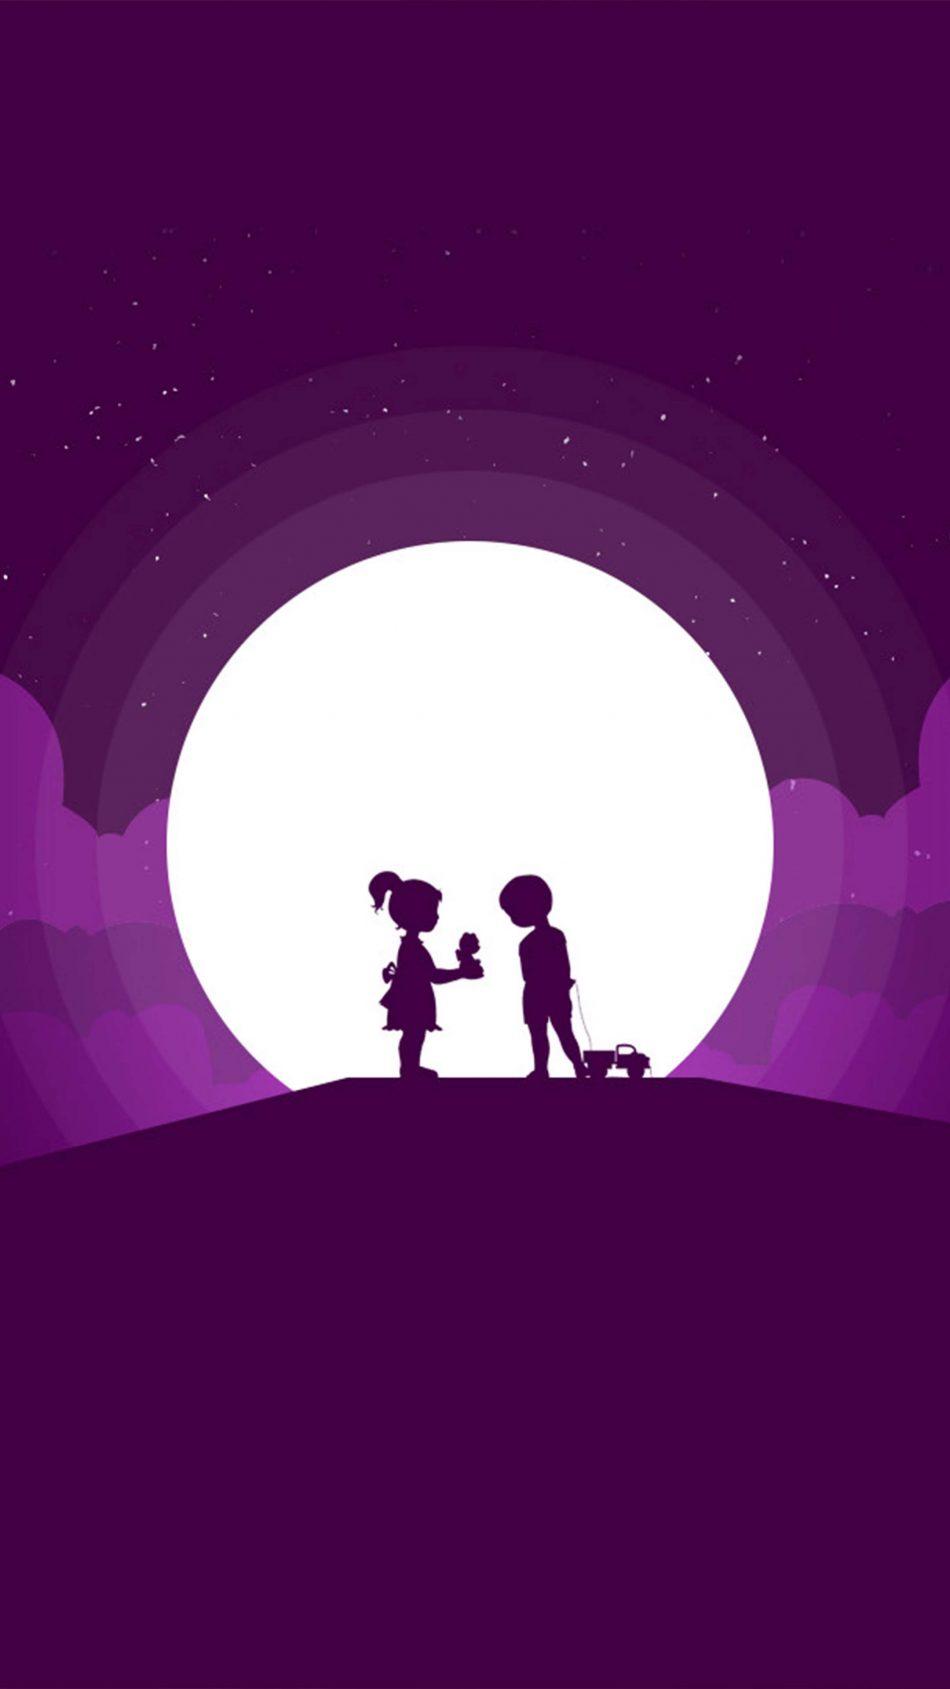 Couple Kids Moon Minimal Silhouette 4K Ultra HD Mobile Wallpaper